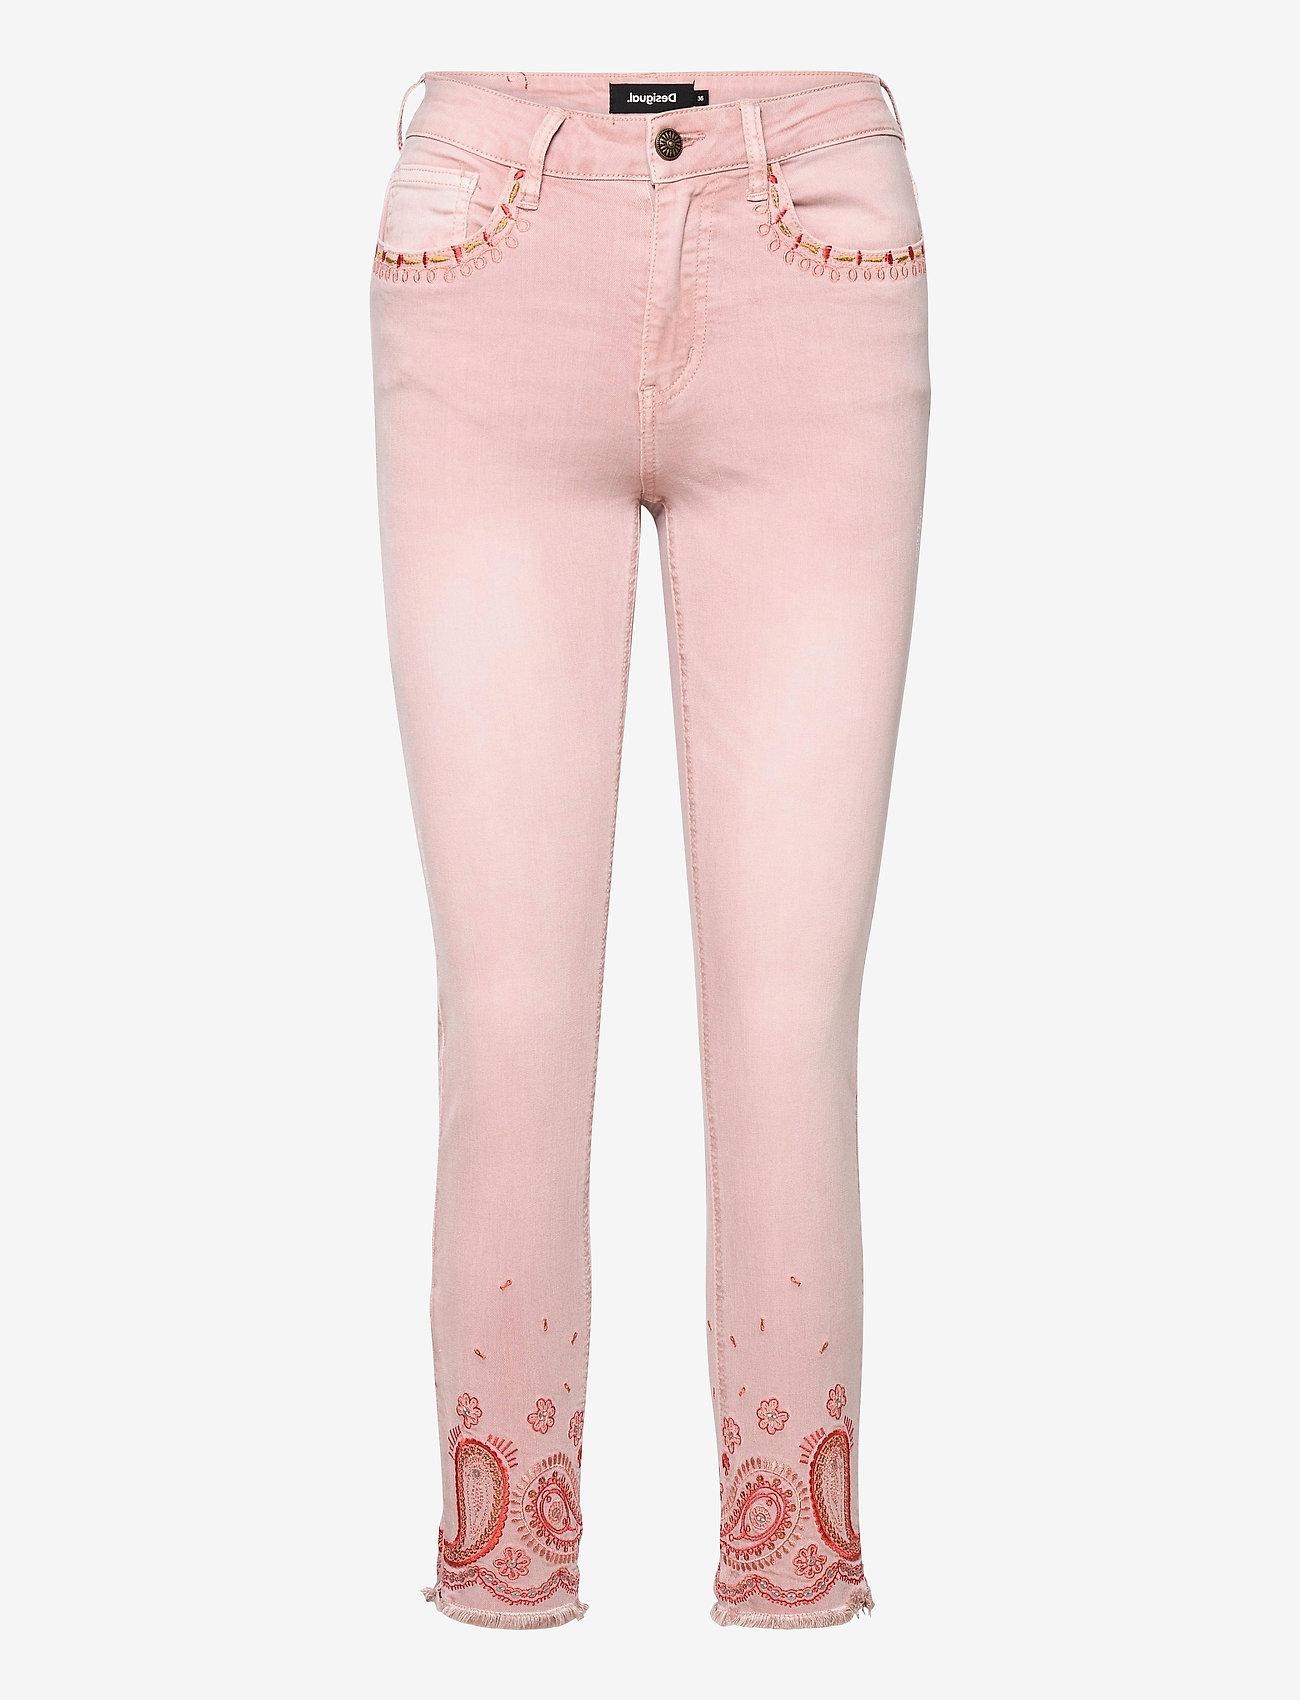 Desigual - PANT ANKLE PAISLE - rosa palo - 0